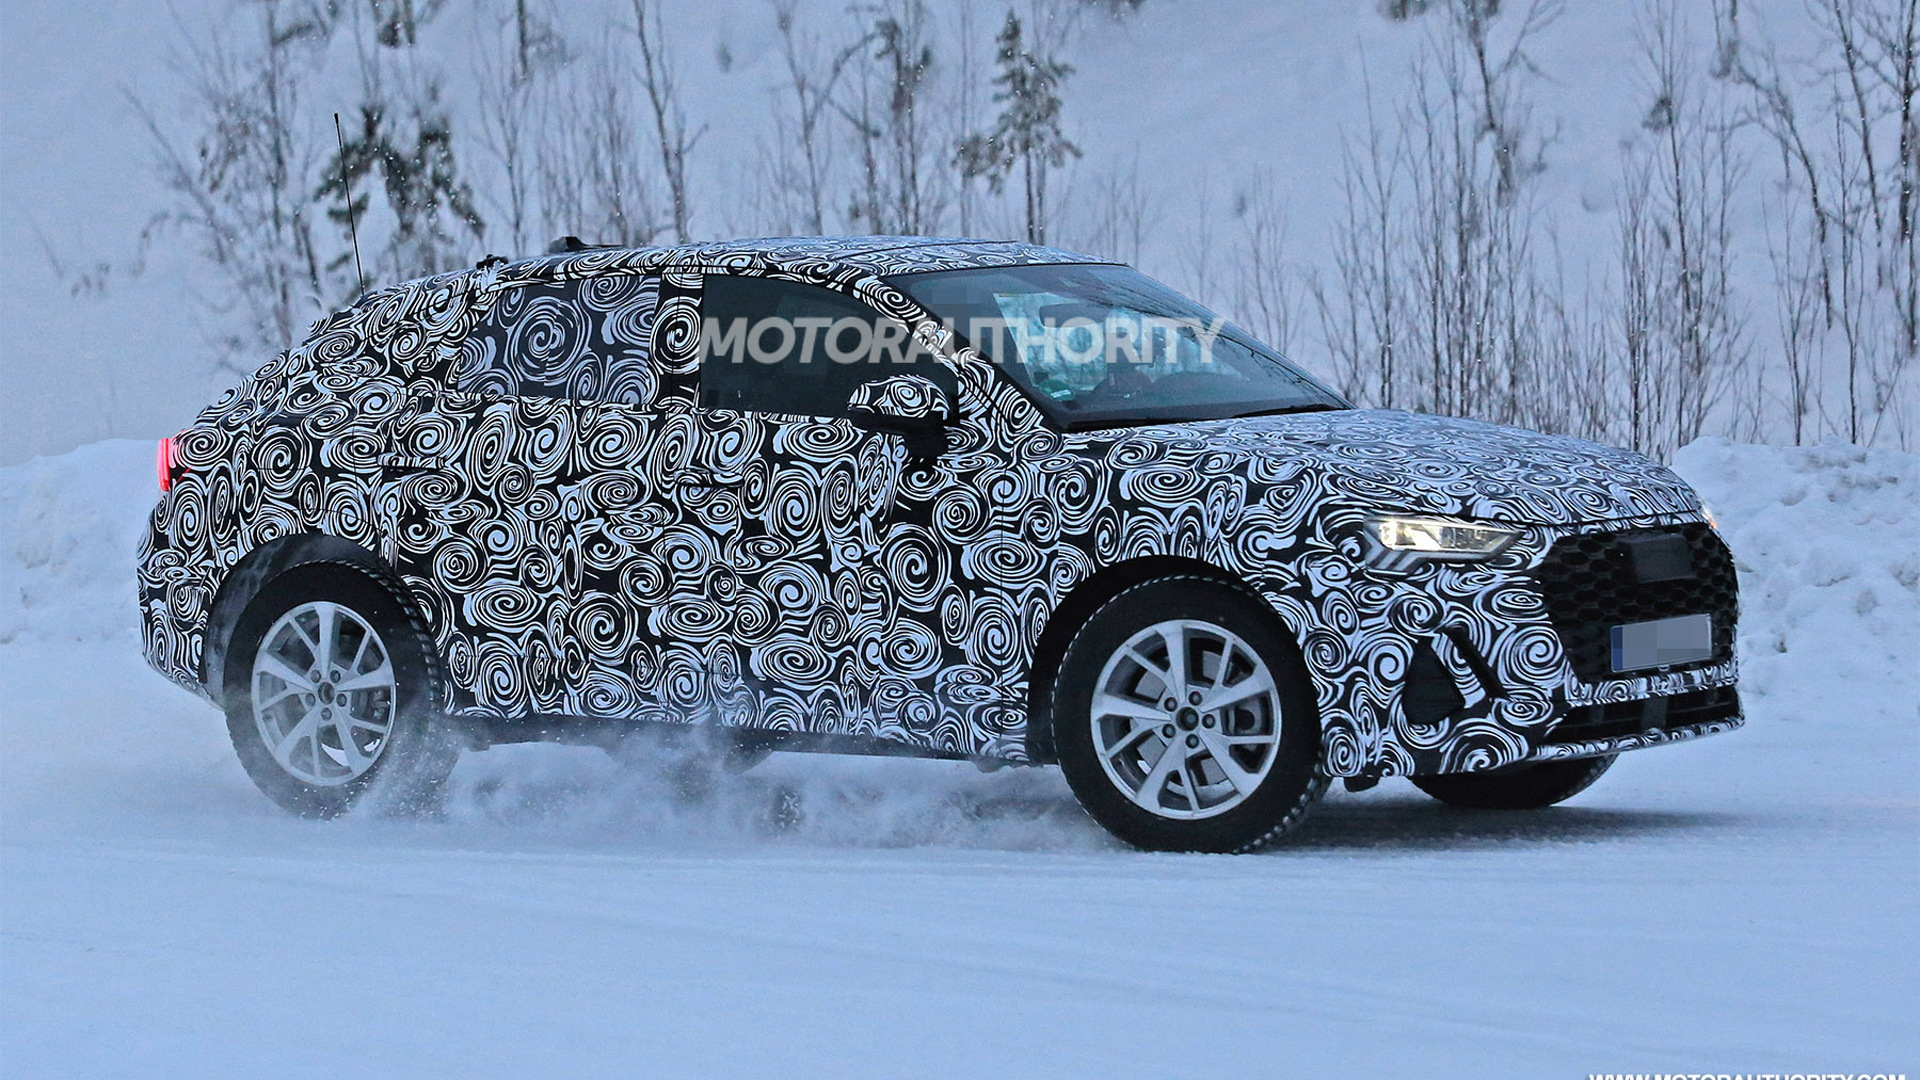 2021 Audi Q4 spy shots - Image via S. Baldauf/SB-Medien